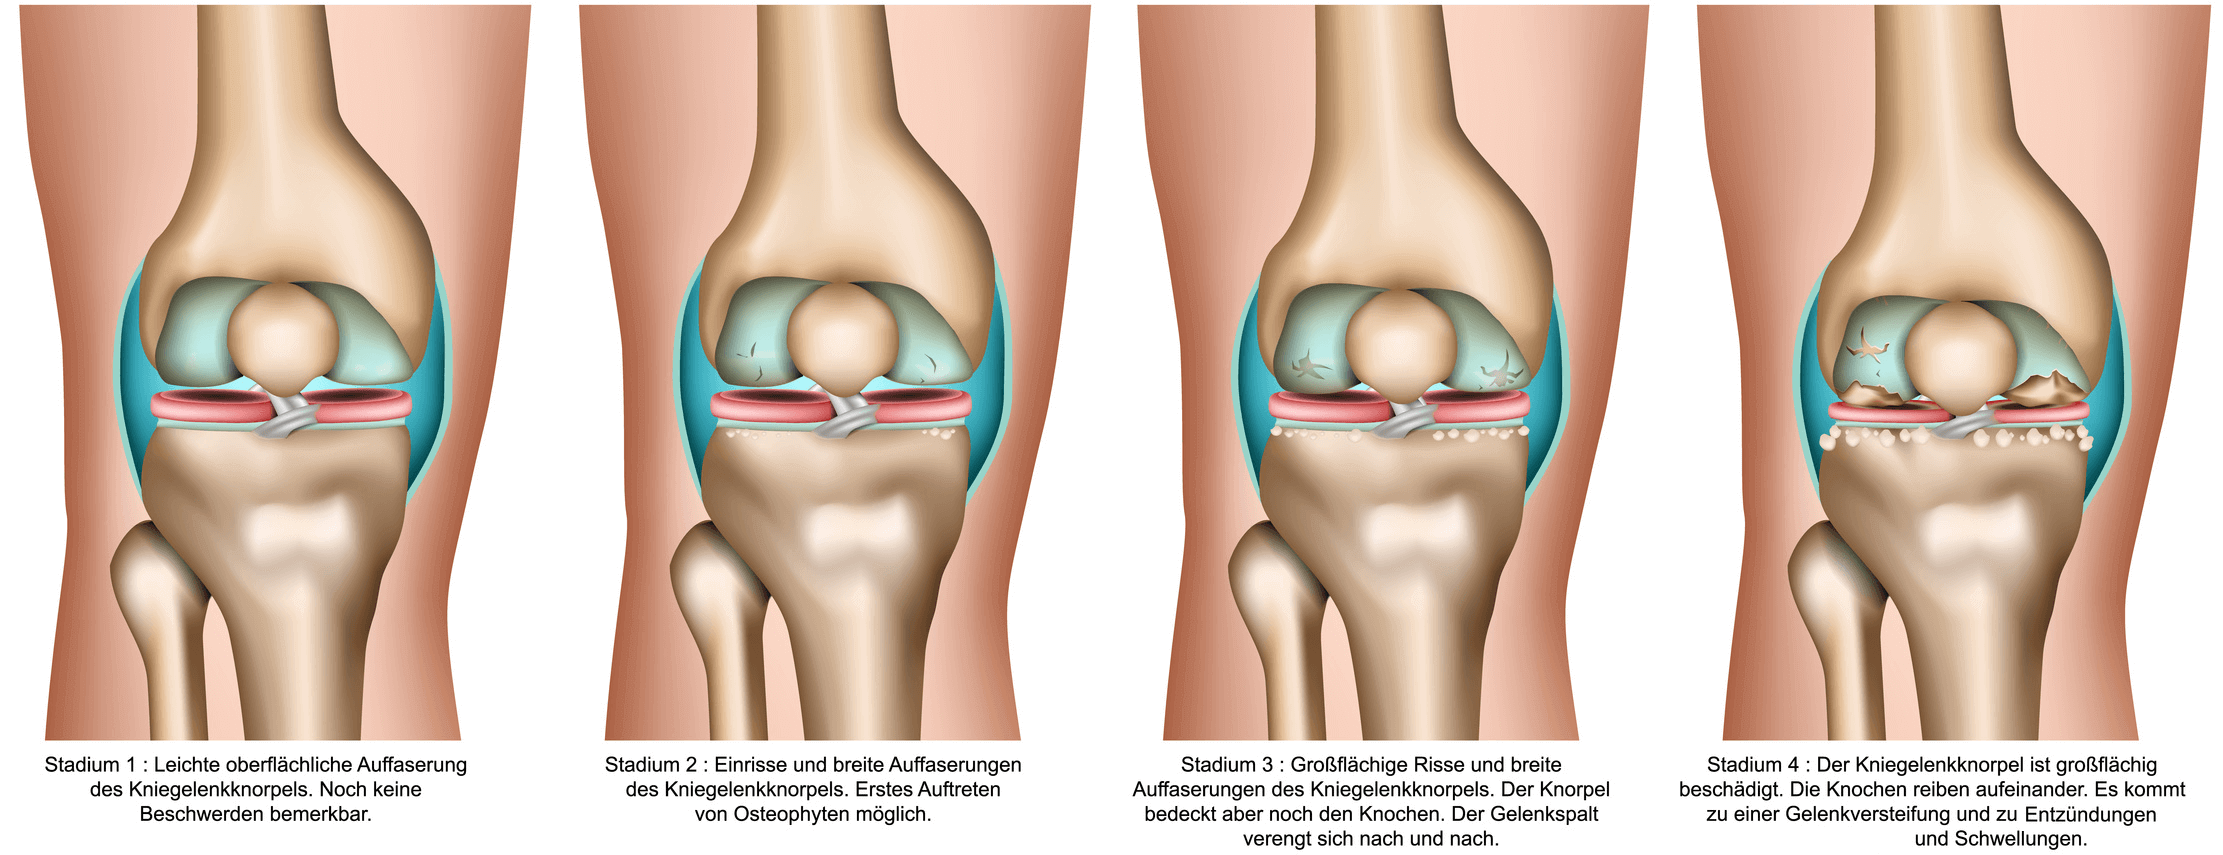 Arthrose behandeln: Welche Therapien gegen Knieschmerzen helfen